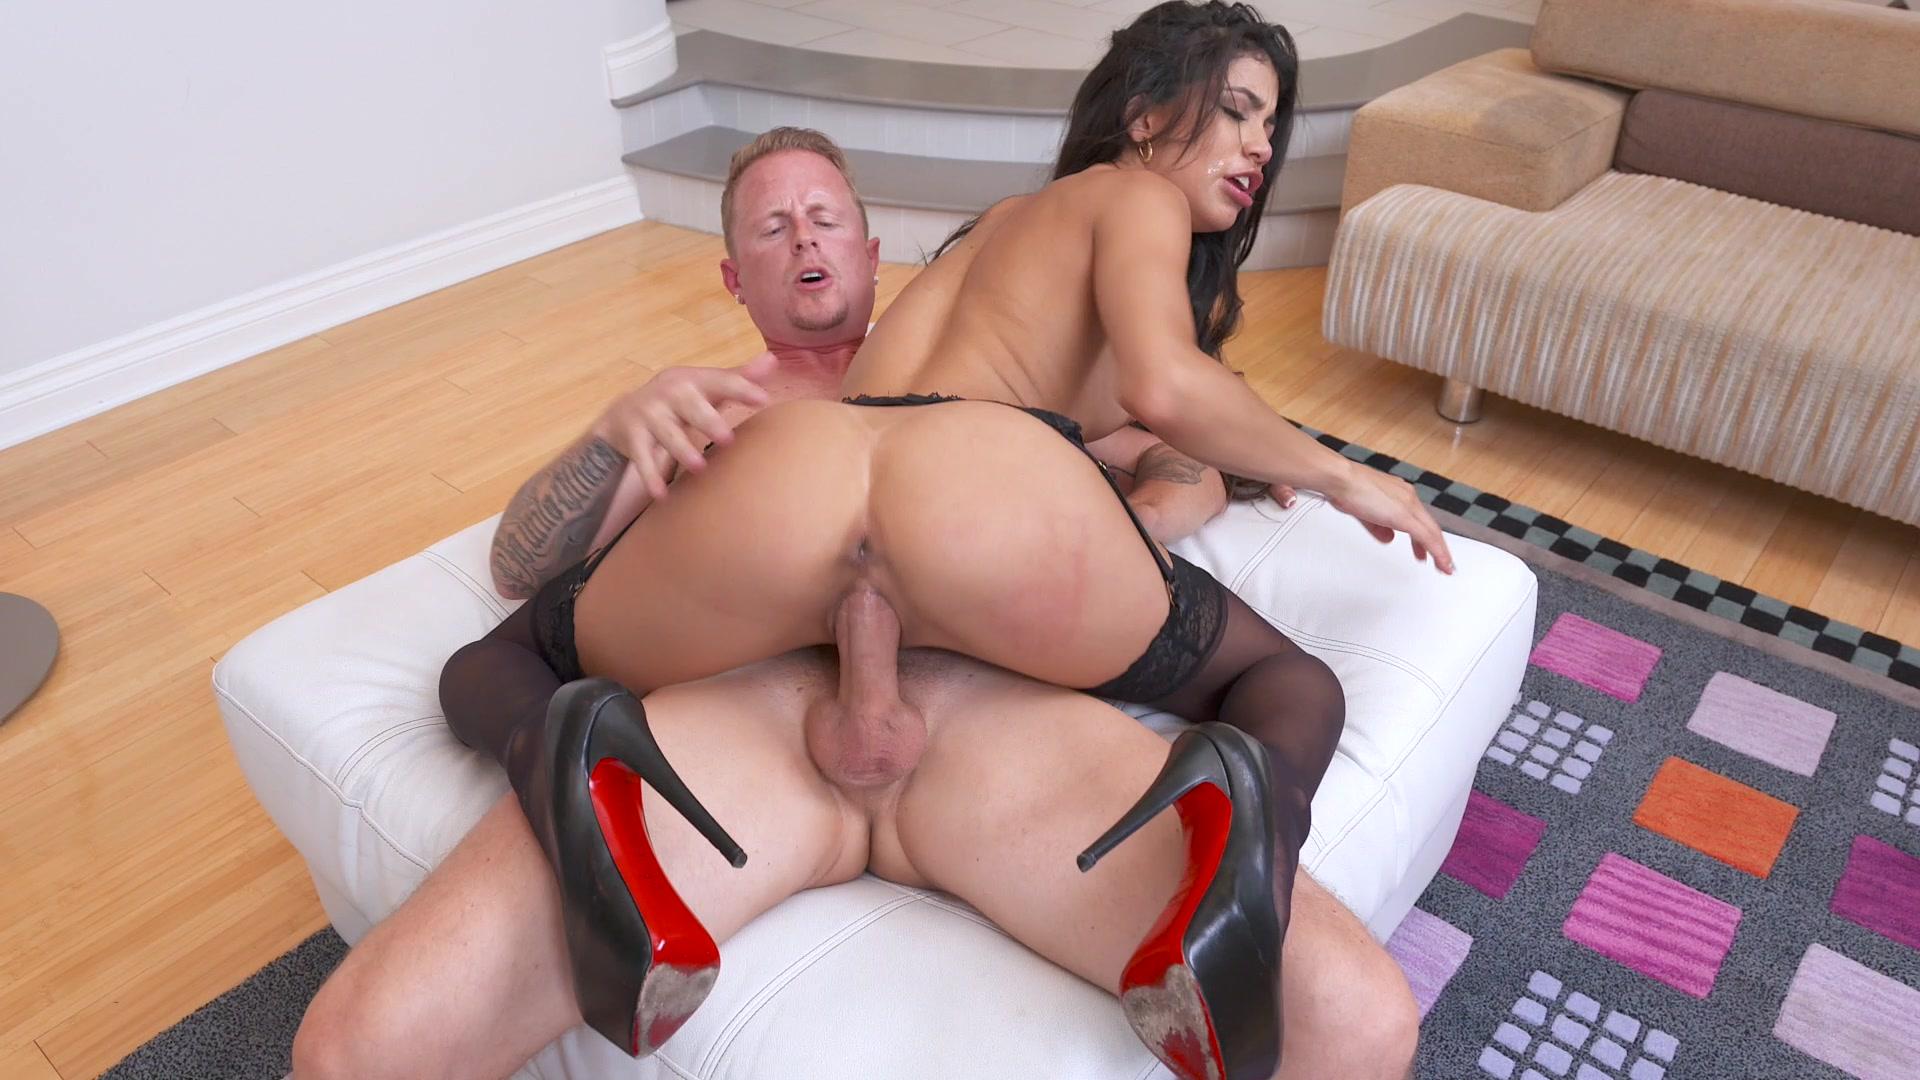 Tommy gunn porn actor model